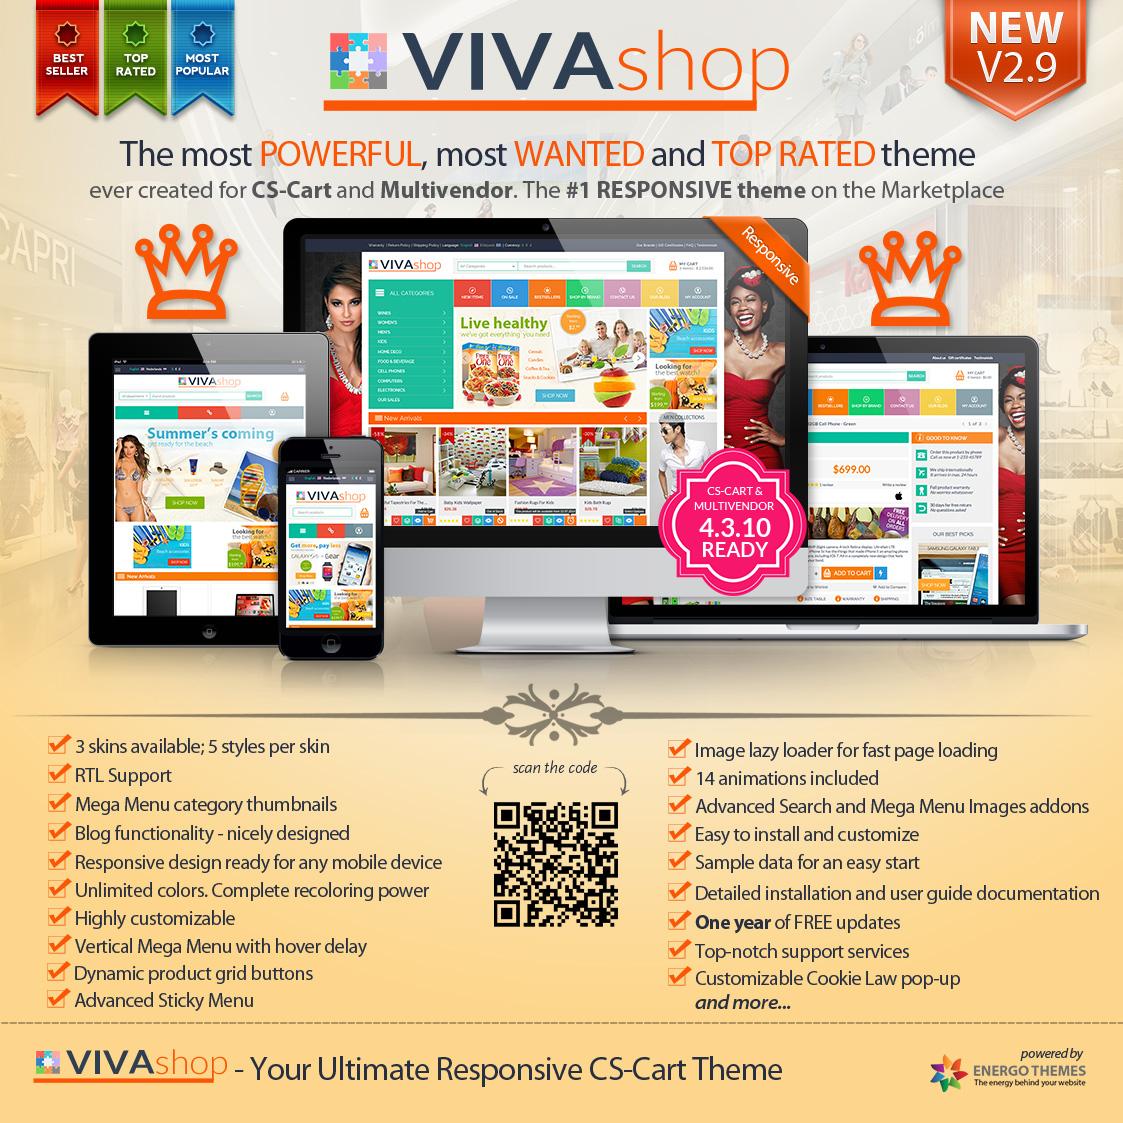 VIVAshop-V2.9-presentation-page-MP.jpg